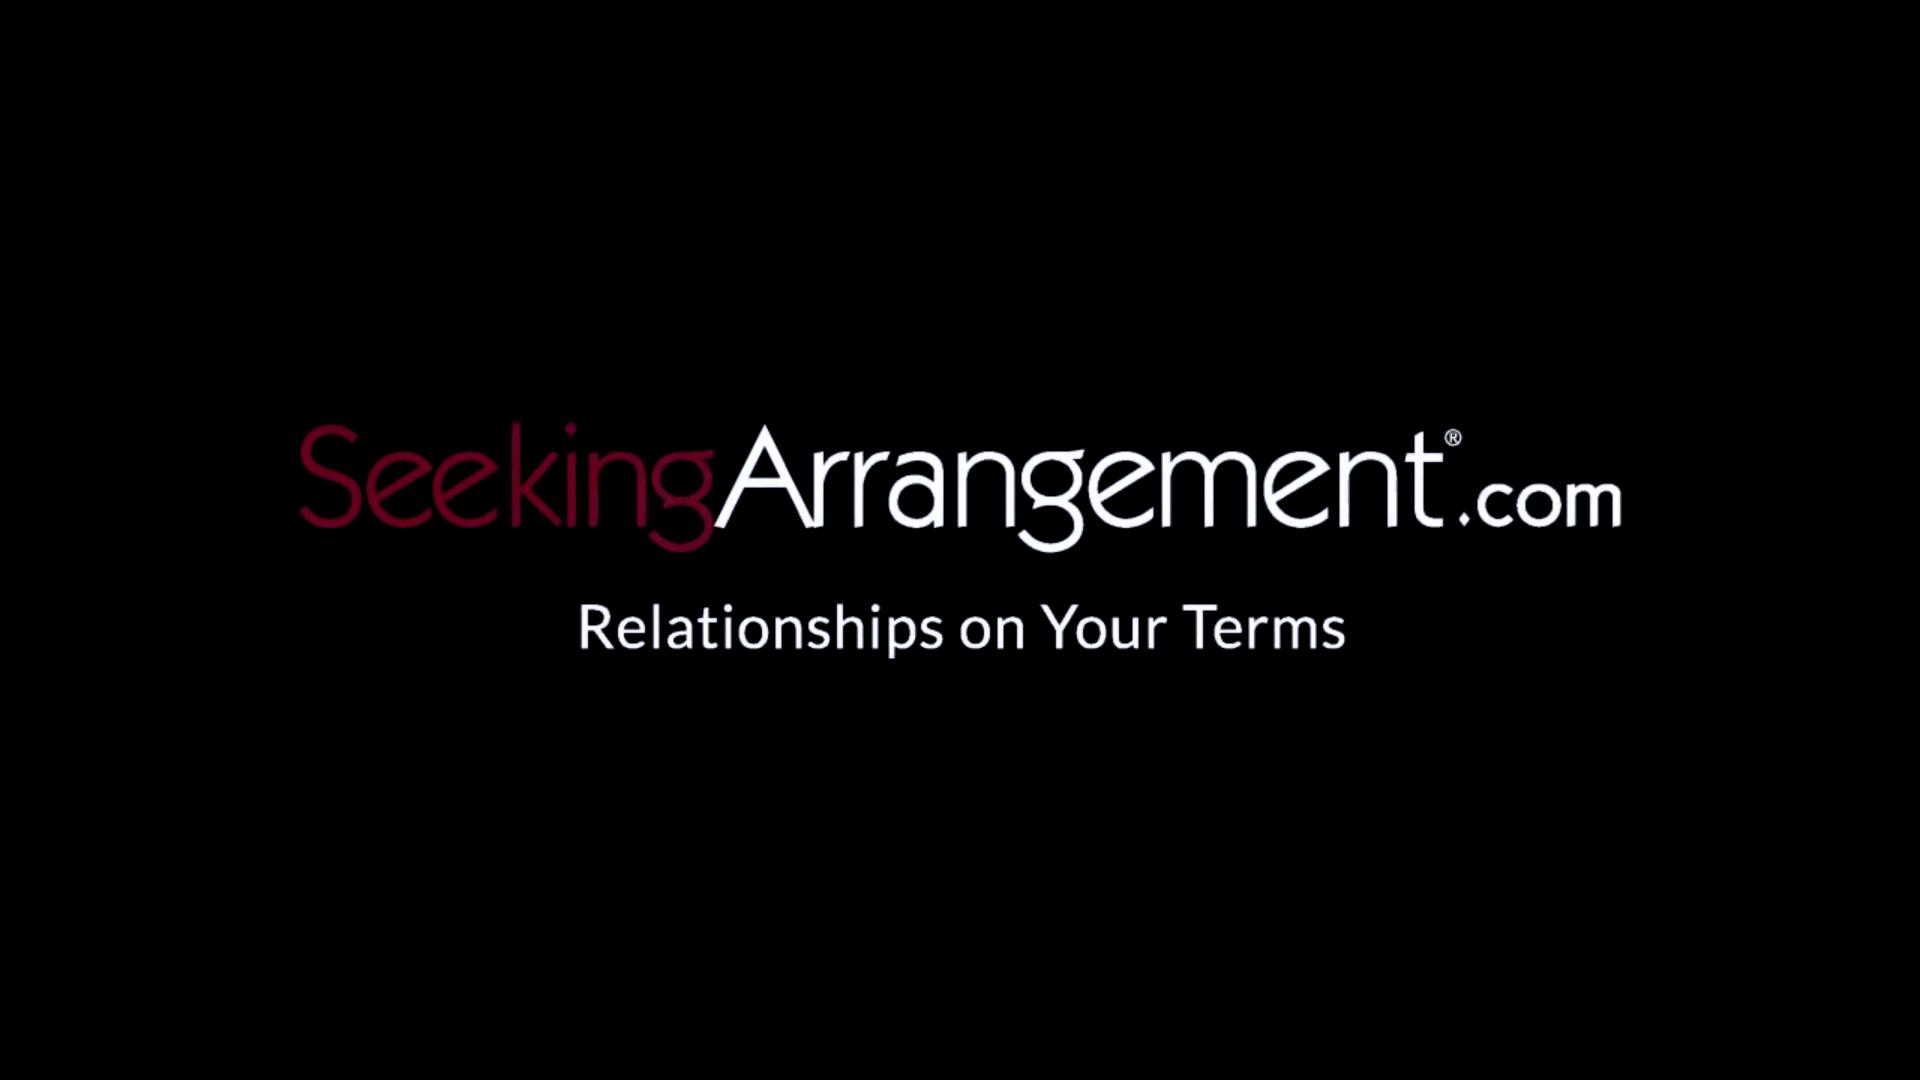 Seeking Arrangement Issues Trademark Infringement Lawsuit Against Successful Match